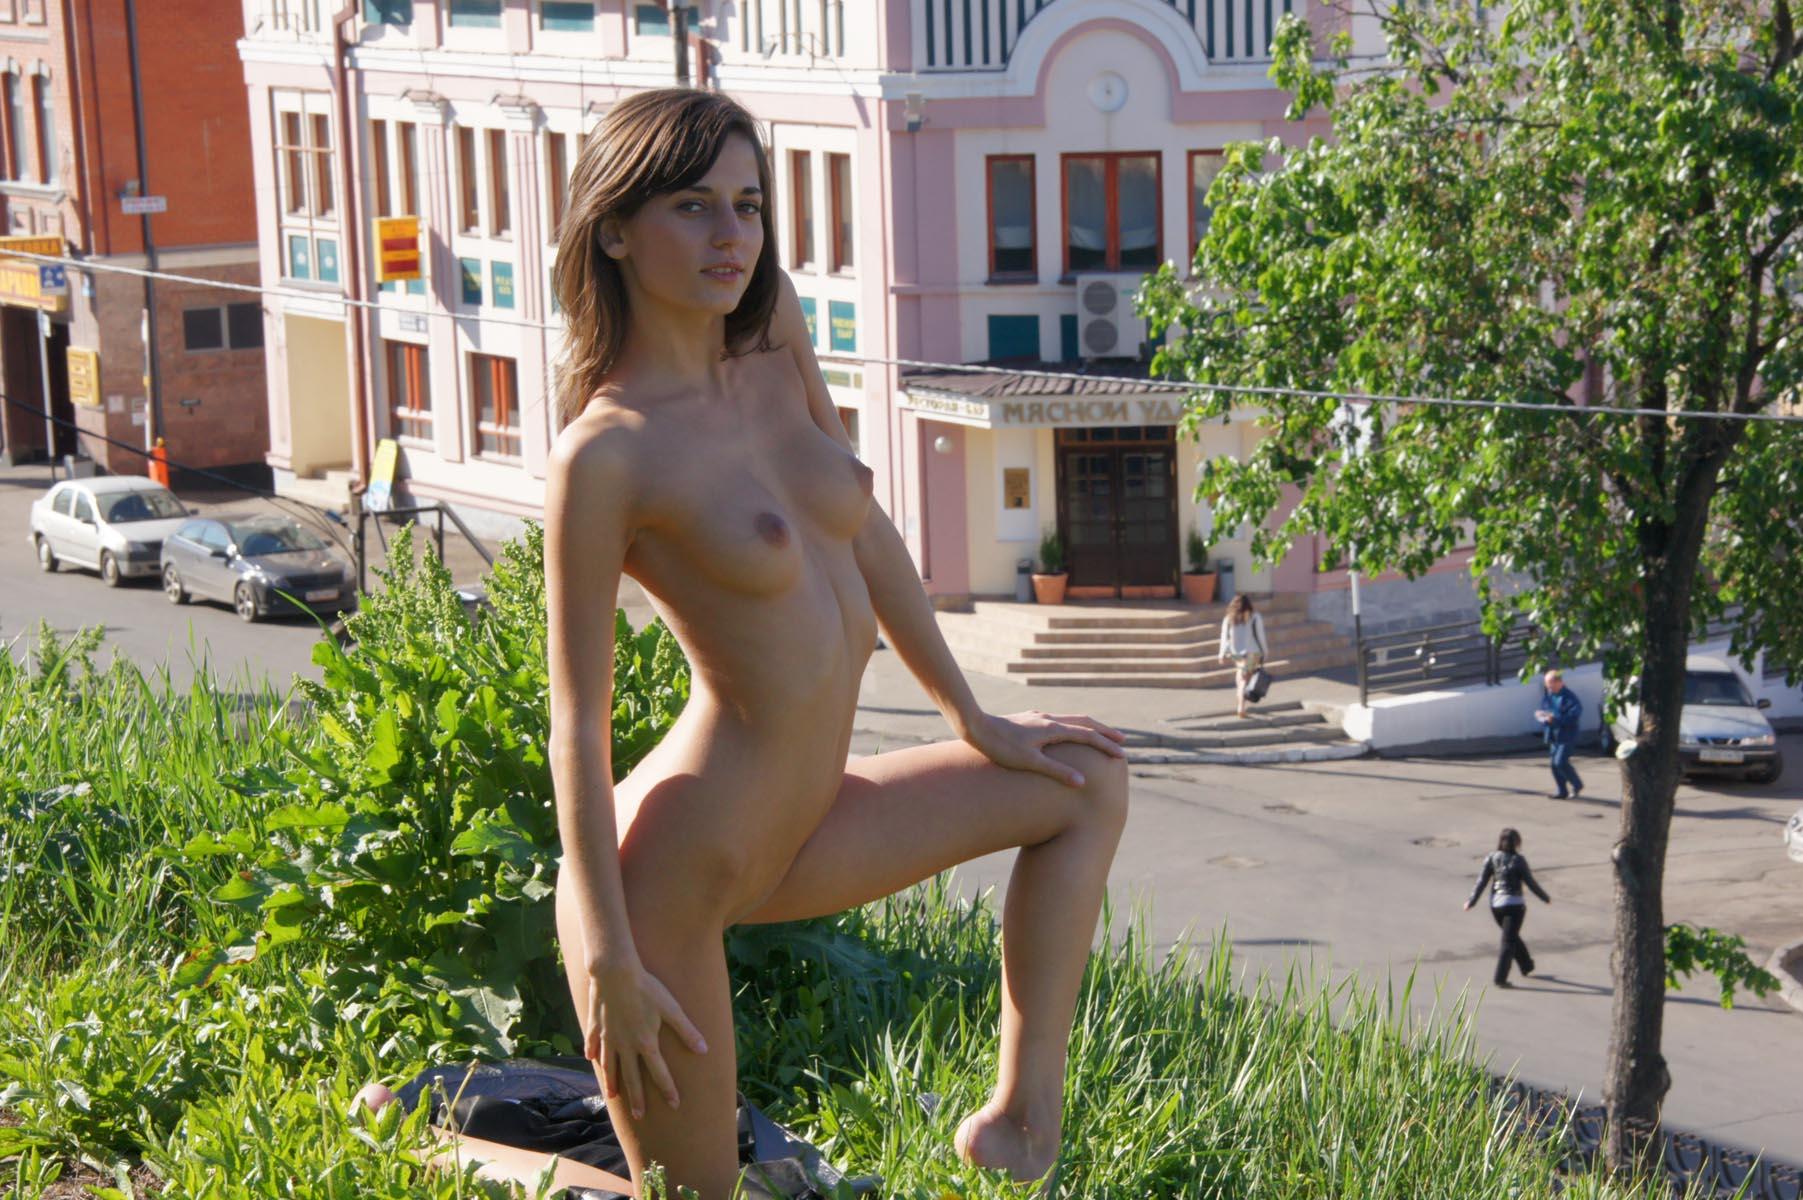 irina-k-naked-in-russia-kazan-nude-public-14